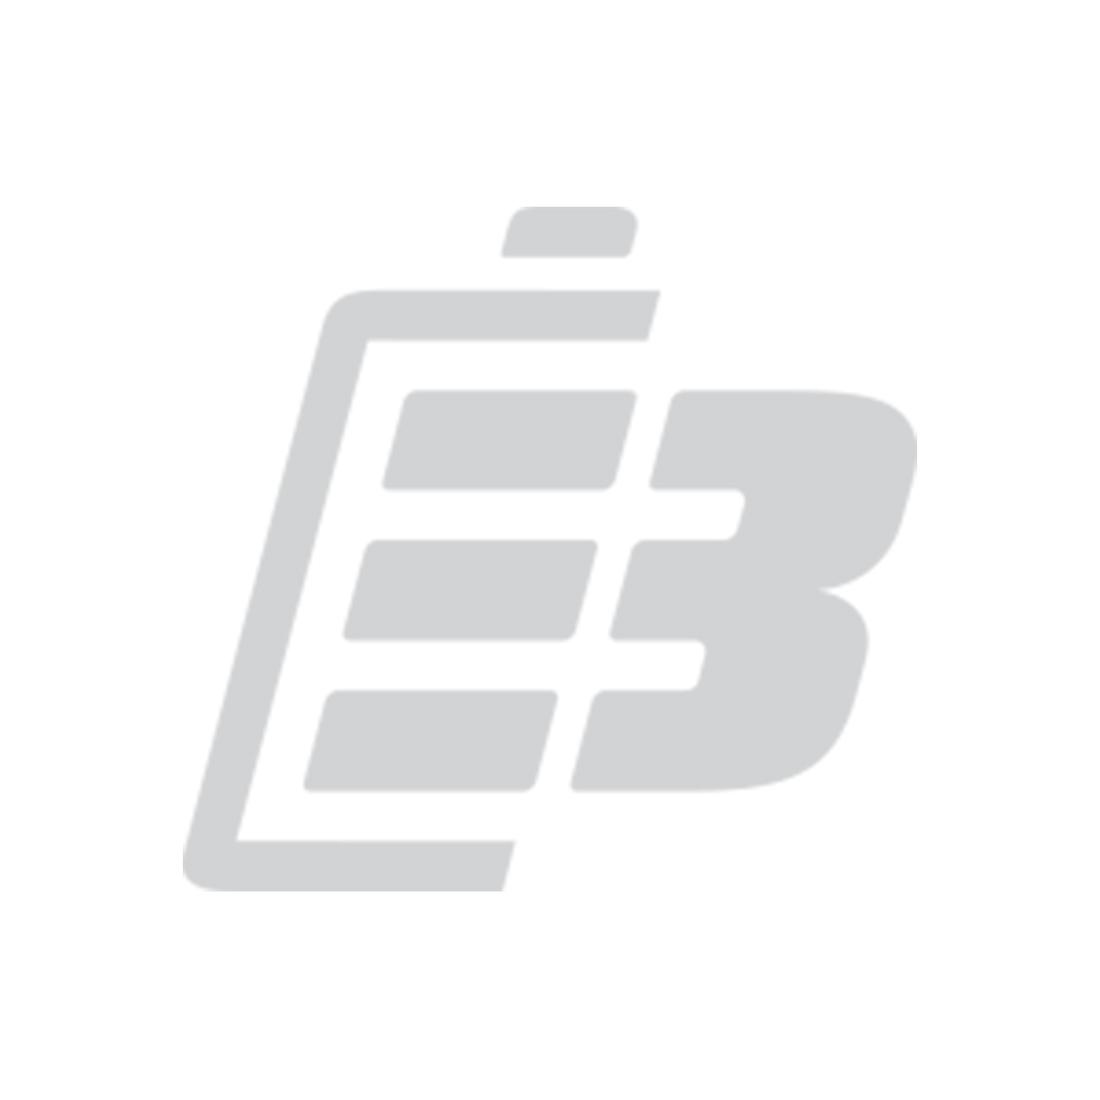 376 - 377 Energizer button Battery 1